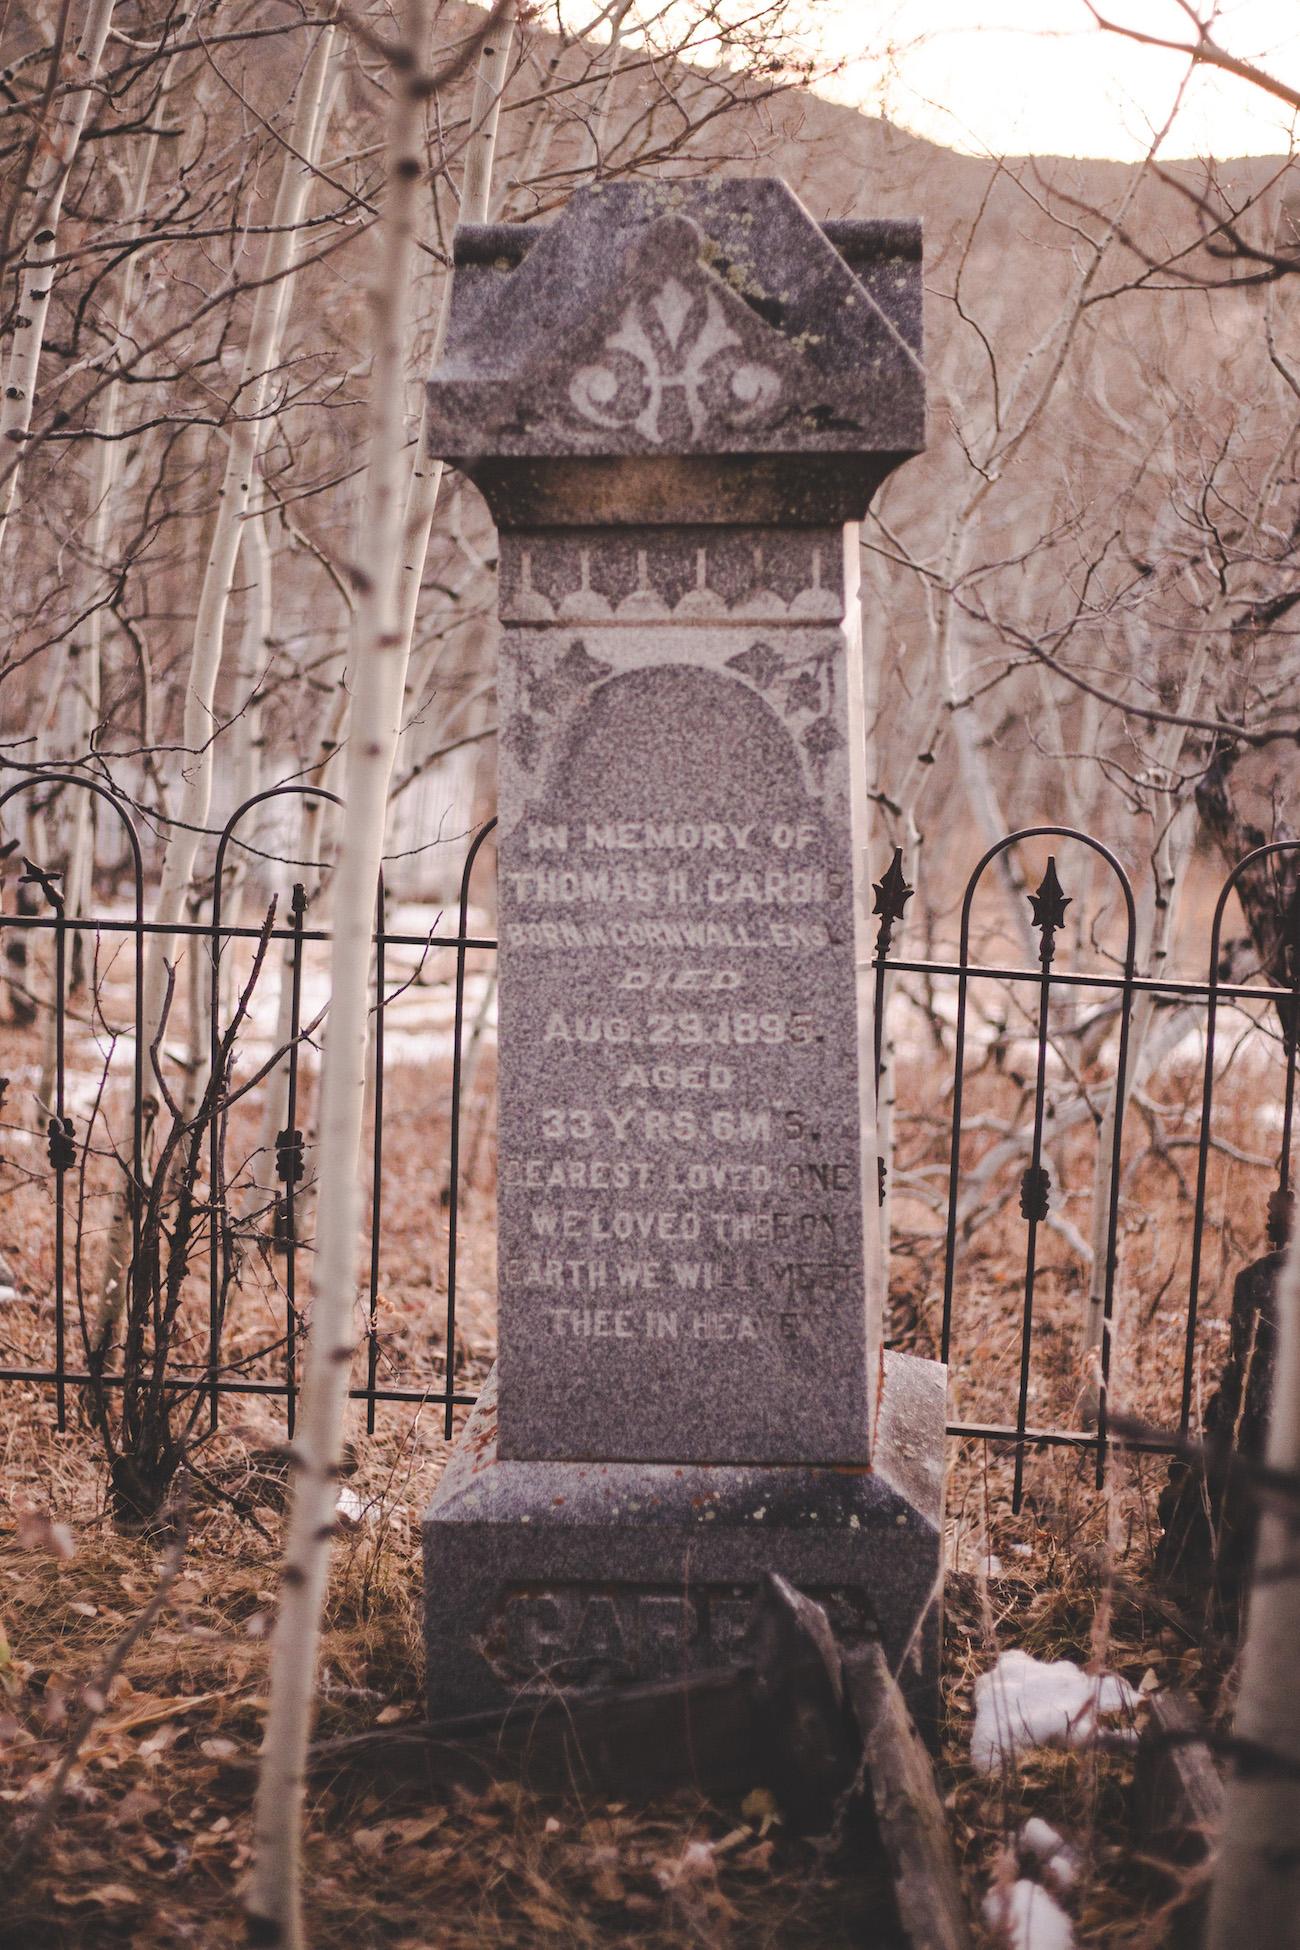 Old gravestone in Central City Cemetery in Colorado